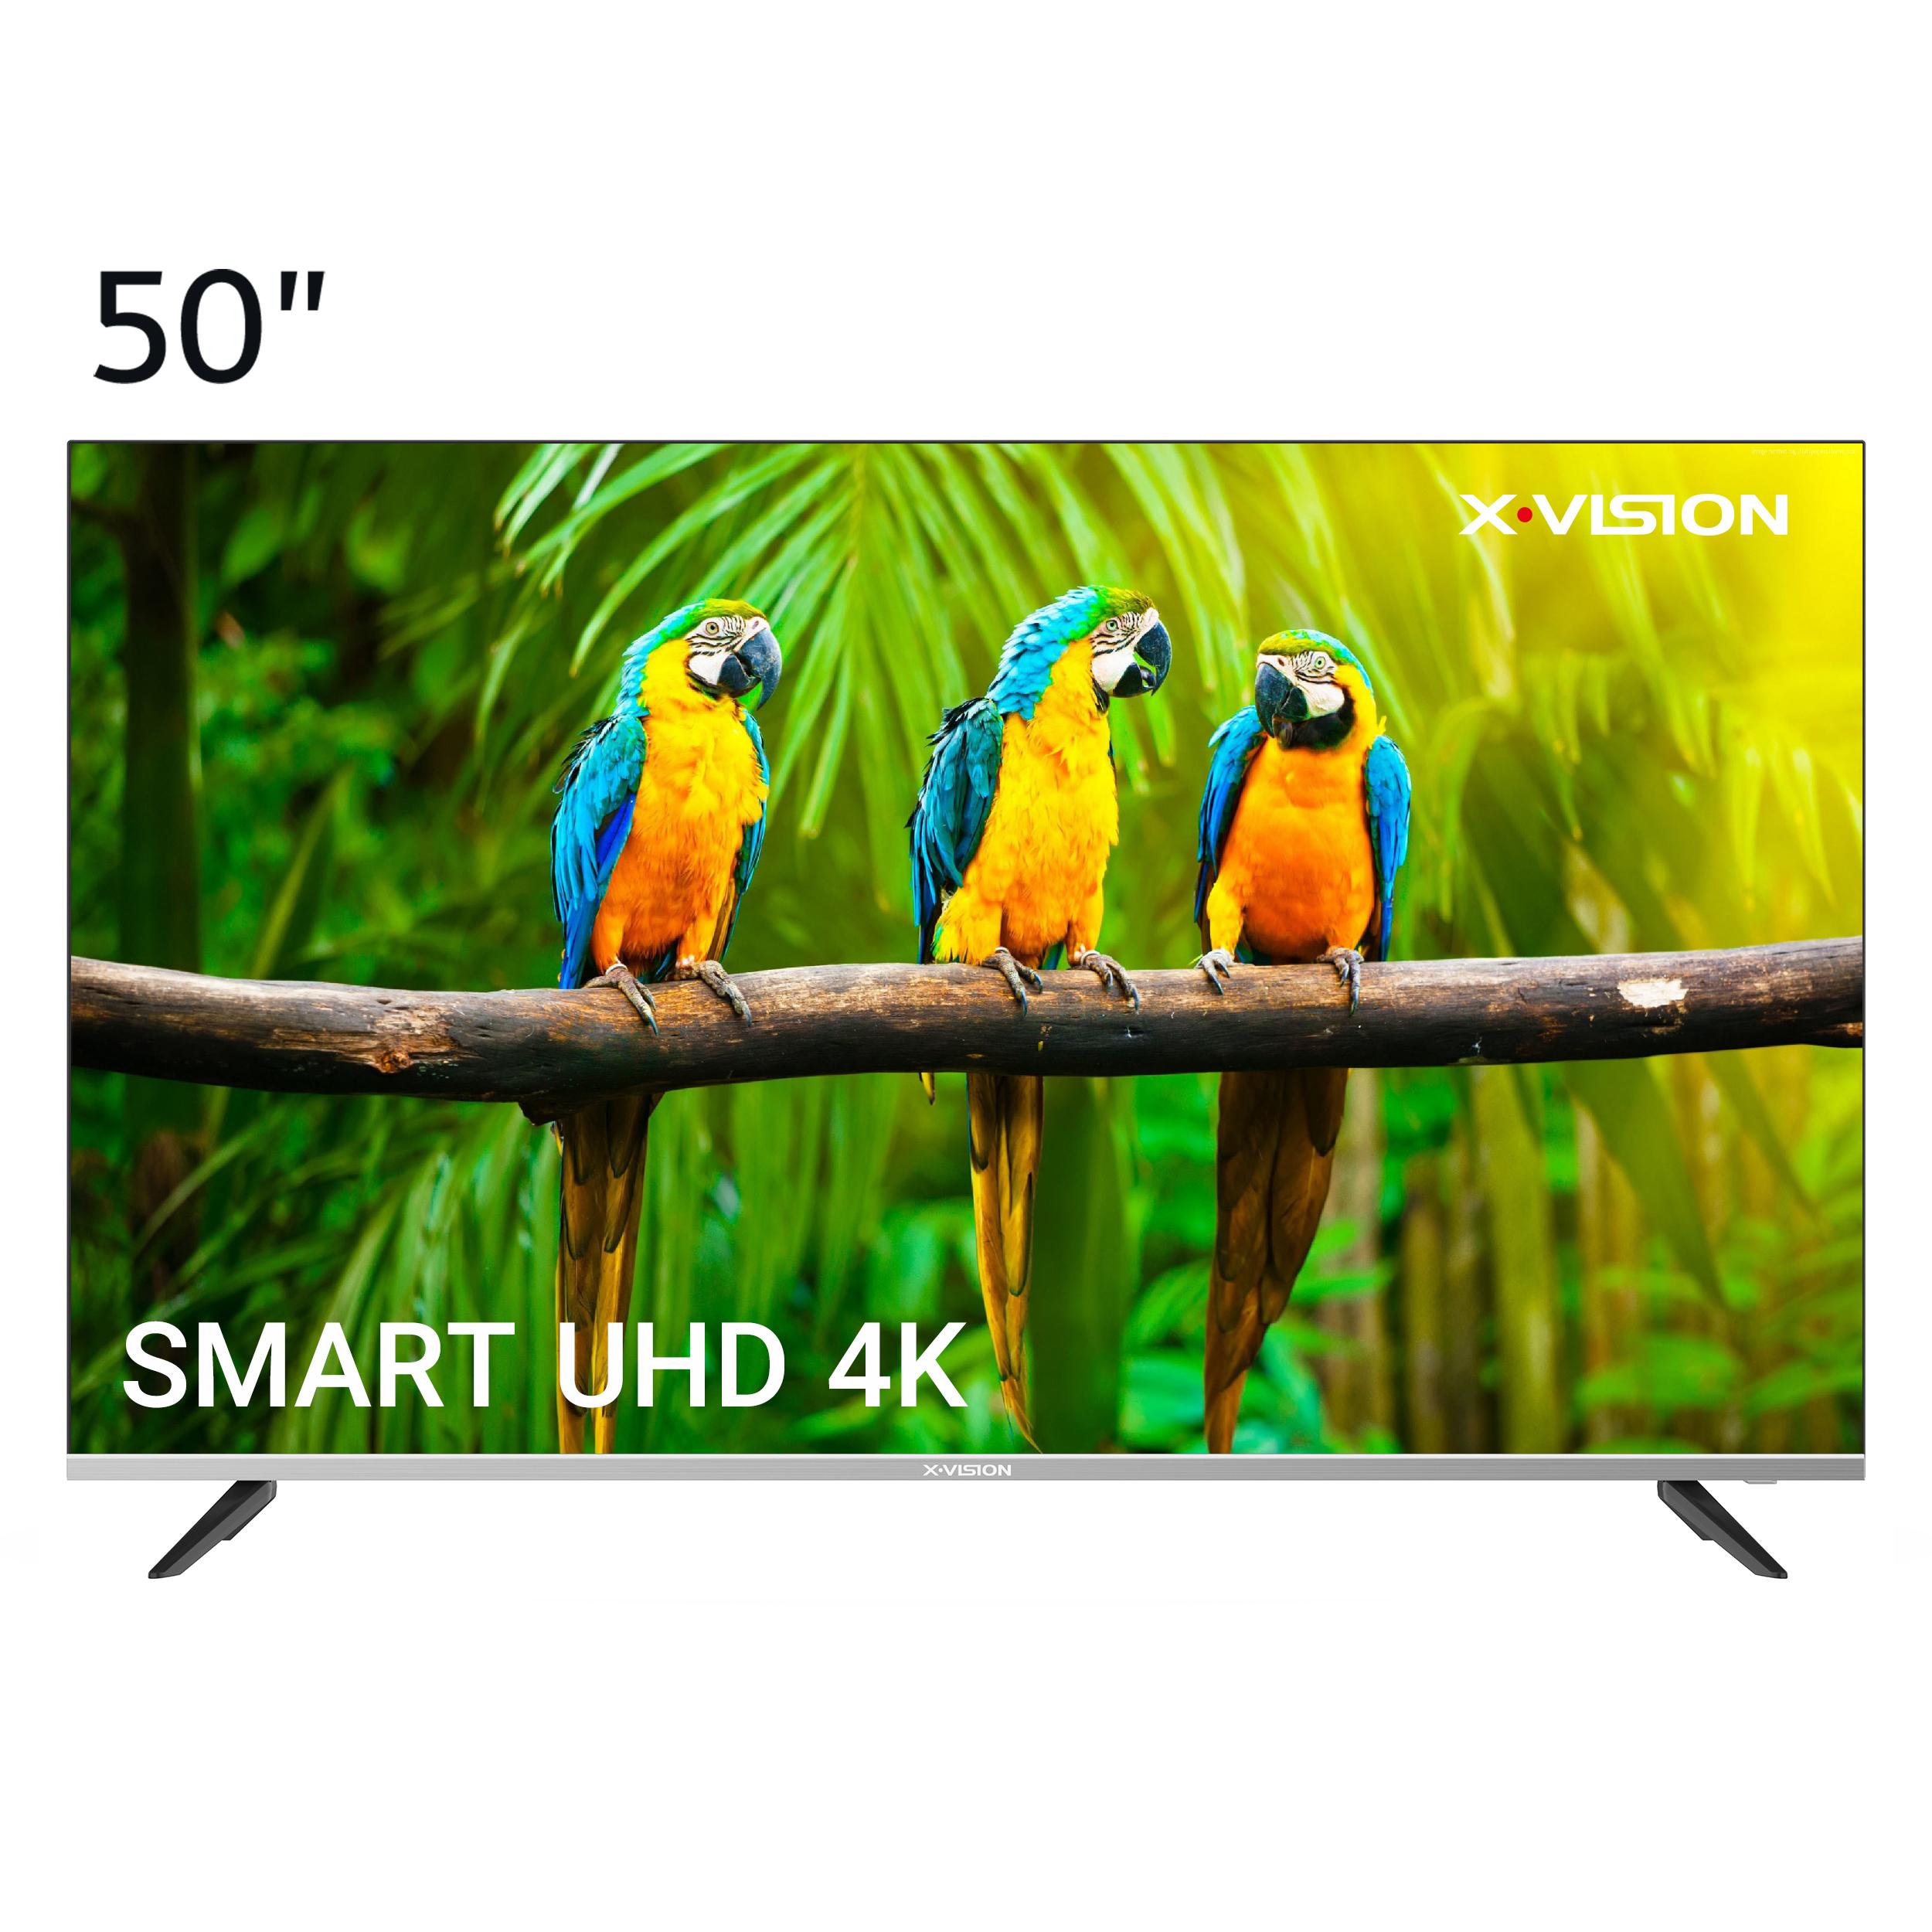 فروش نقدی و اقساطی تلویزیون ال ای دی هوشمند ایکس ویژن مدل 50XCU585 سایز 50 اینچ